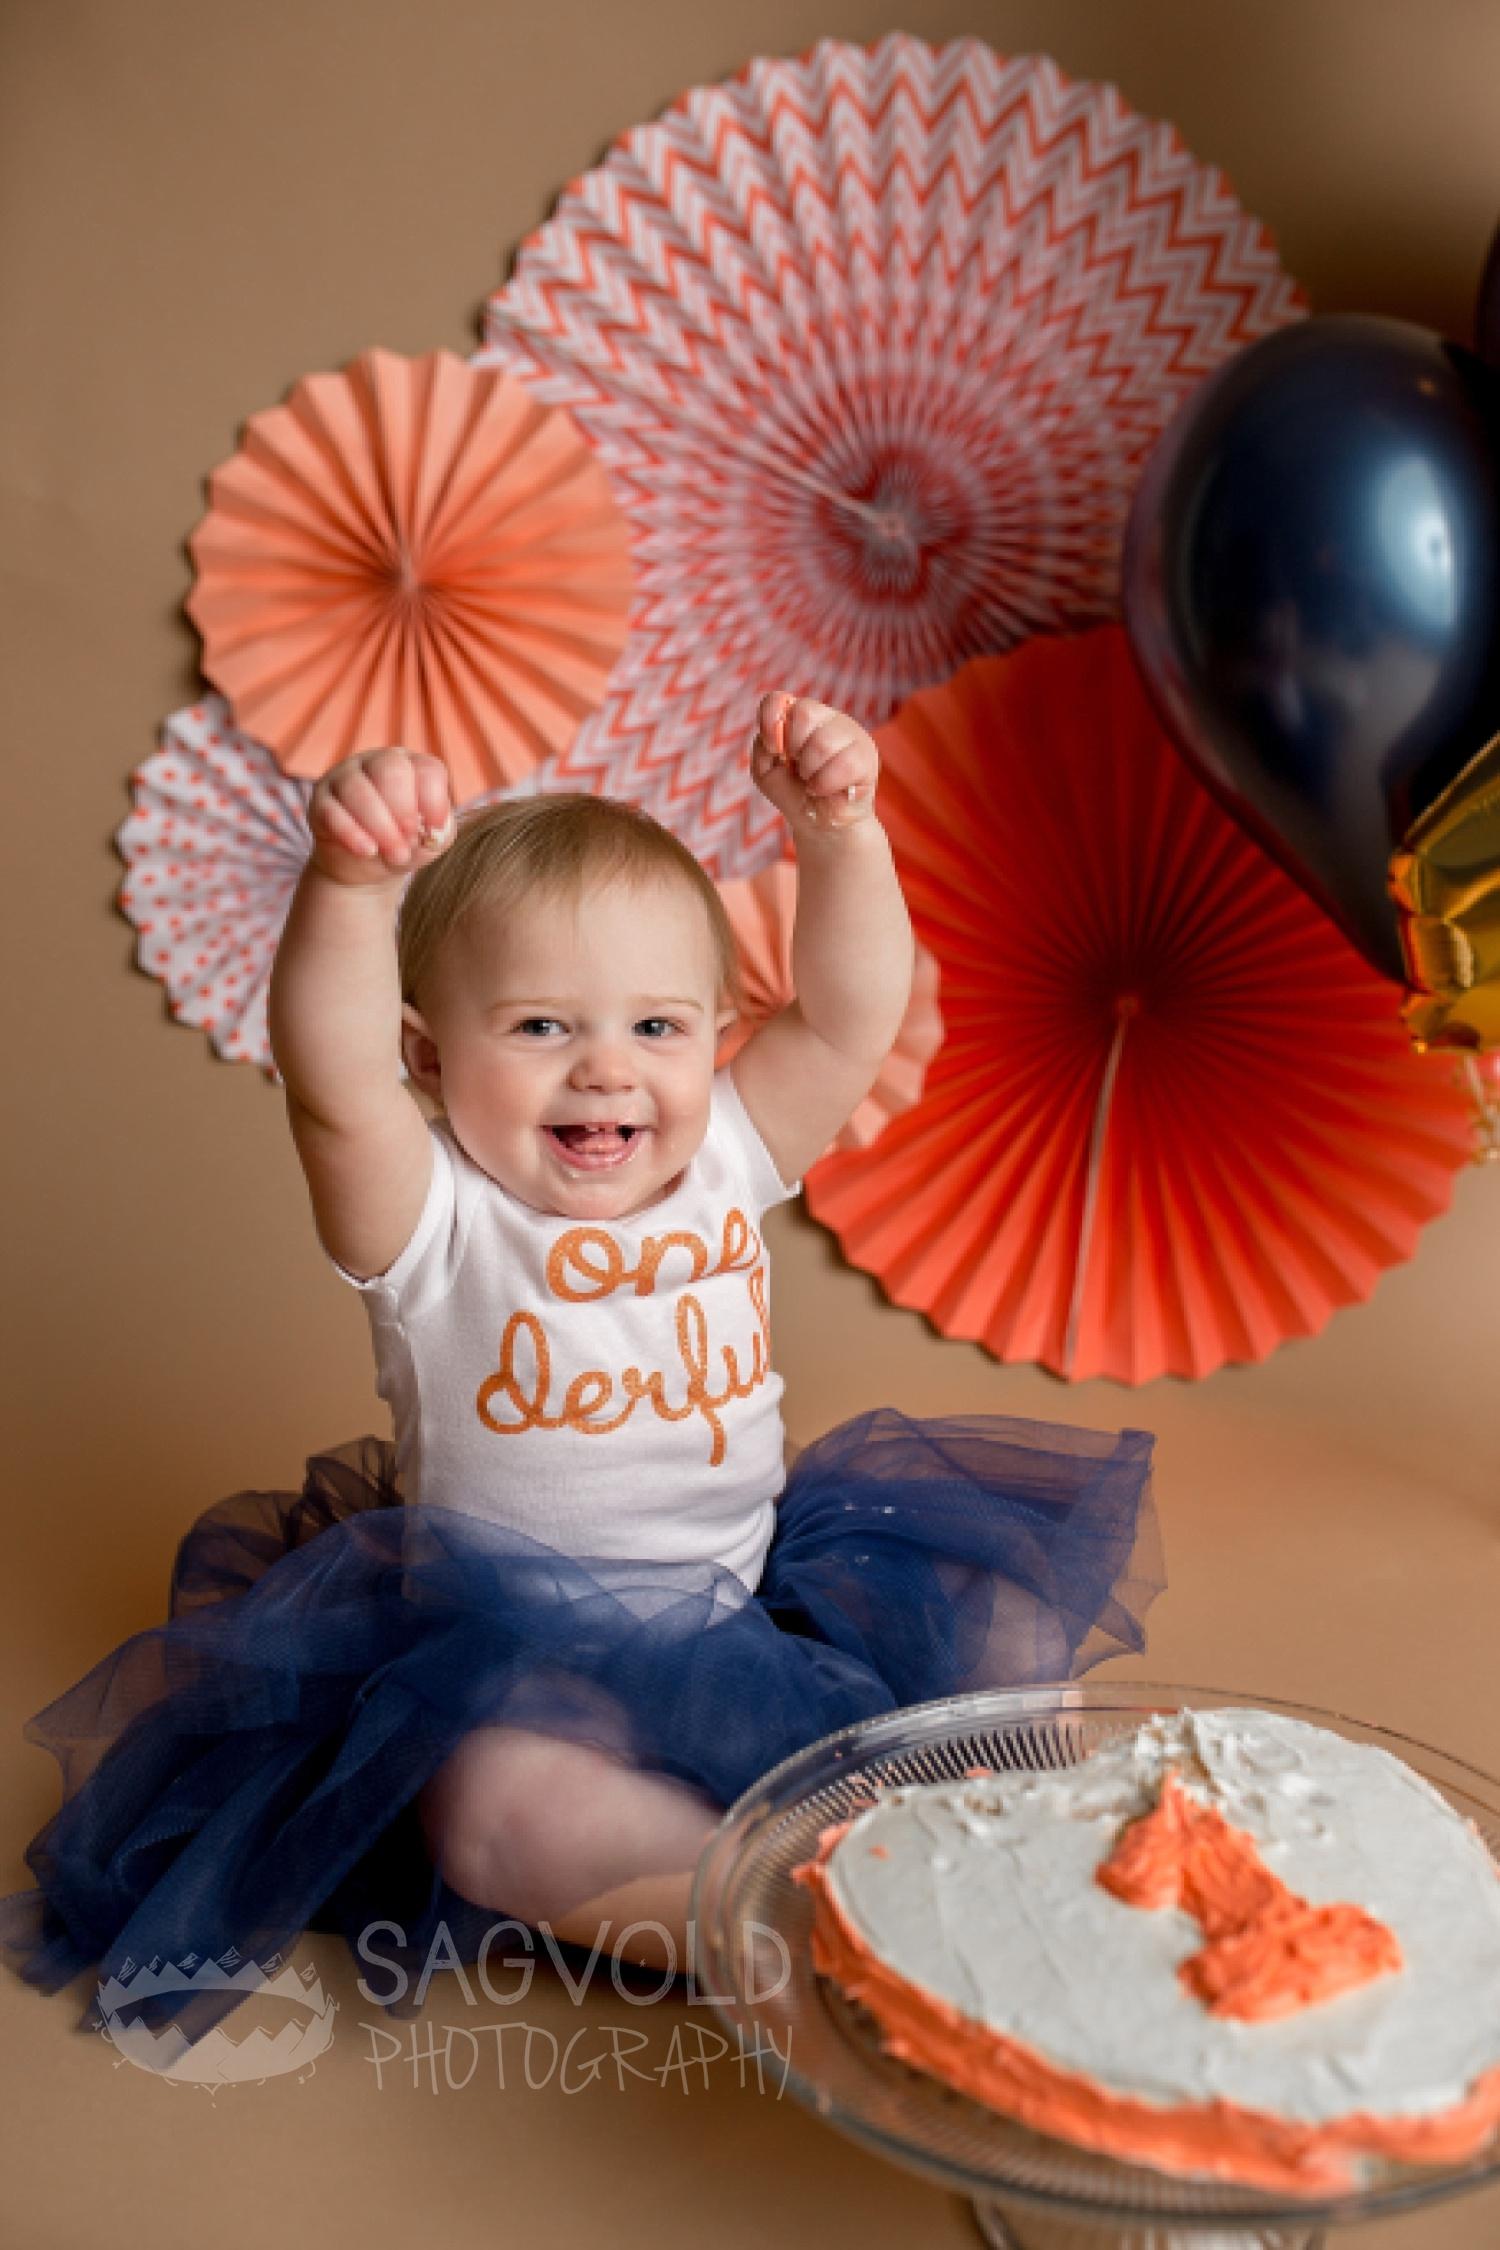 Cake smash Fargo ND baby photographer Janna Sagvold Photography